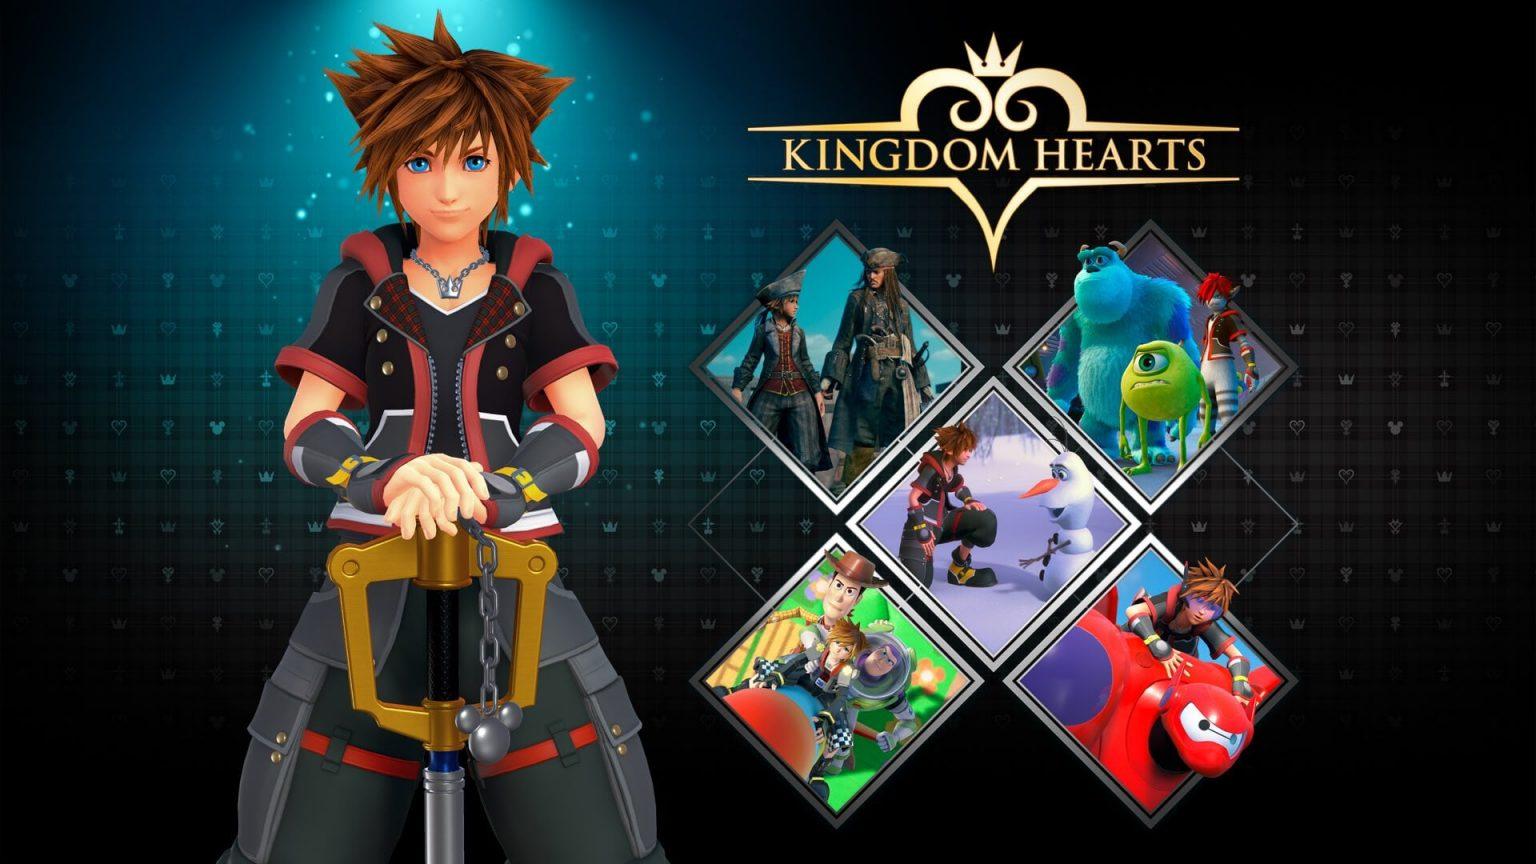 Kingdom Hearts 3 Apk iOS Latest Version Free Download